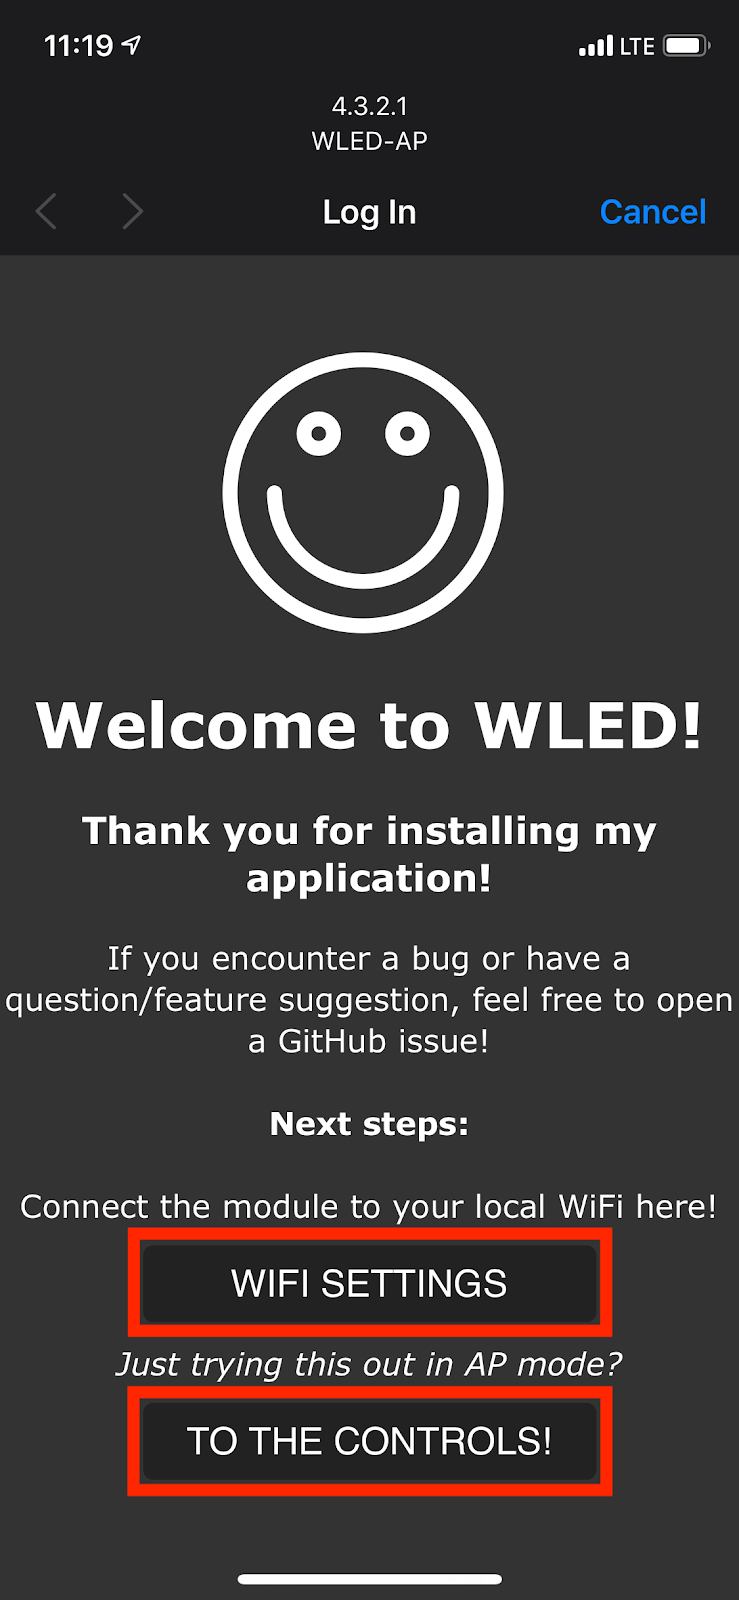 WLED captive portal